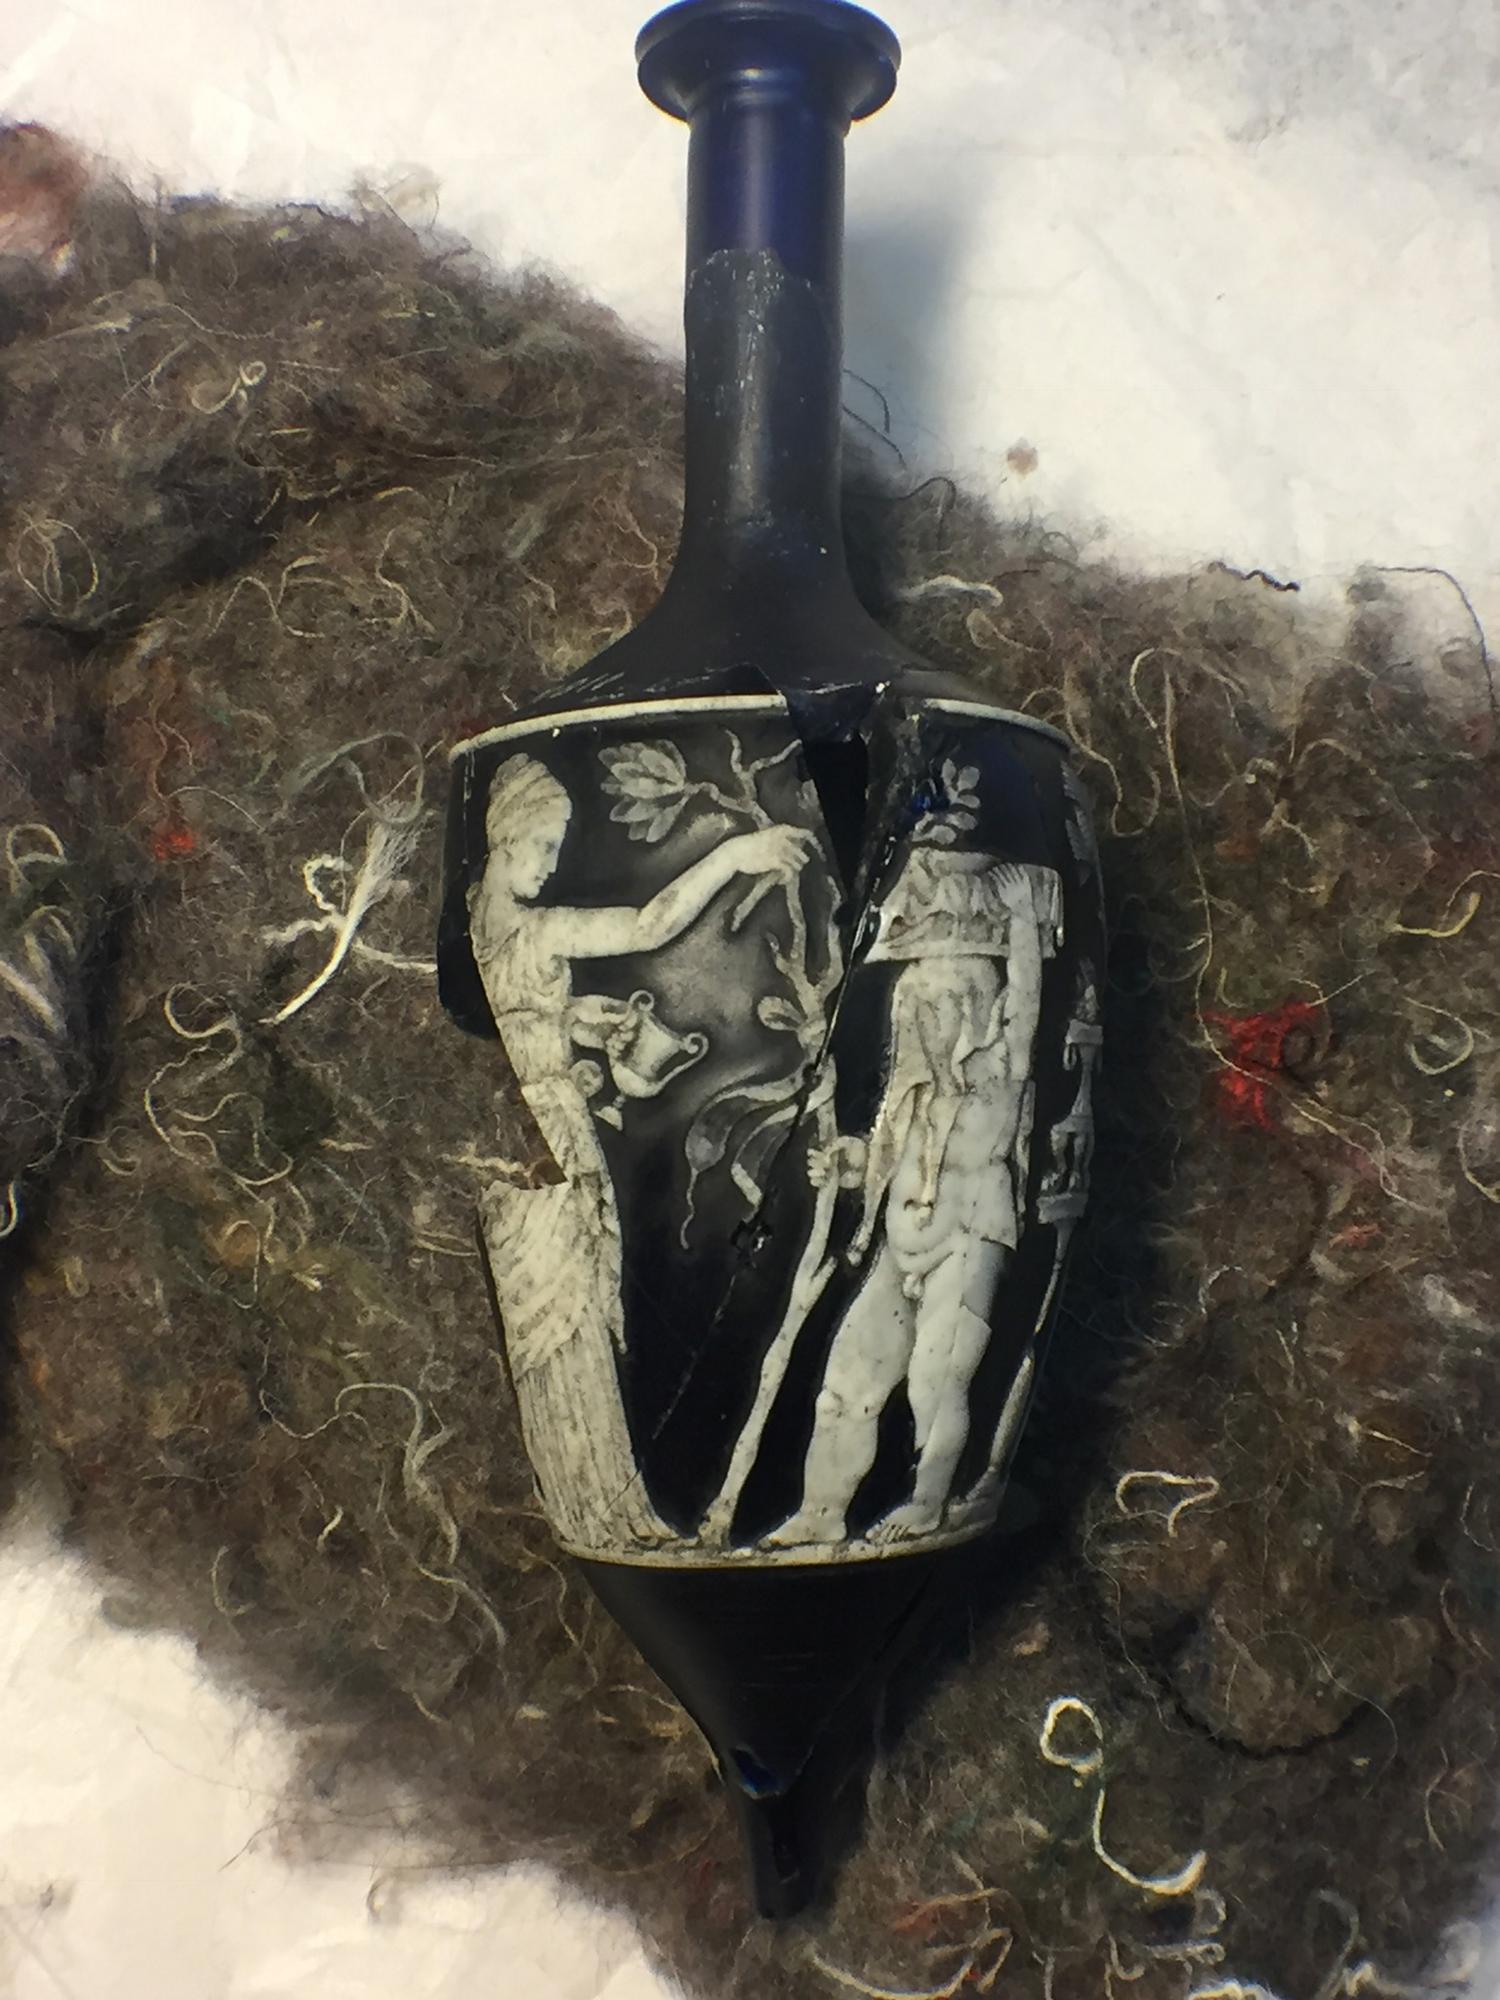 Roman cameo glass bottle found at Torrita di Siena, Tuscany, Italy.